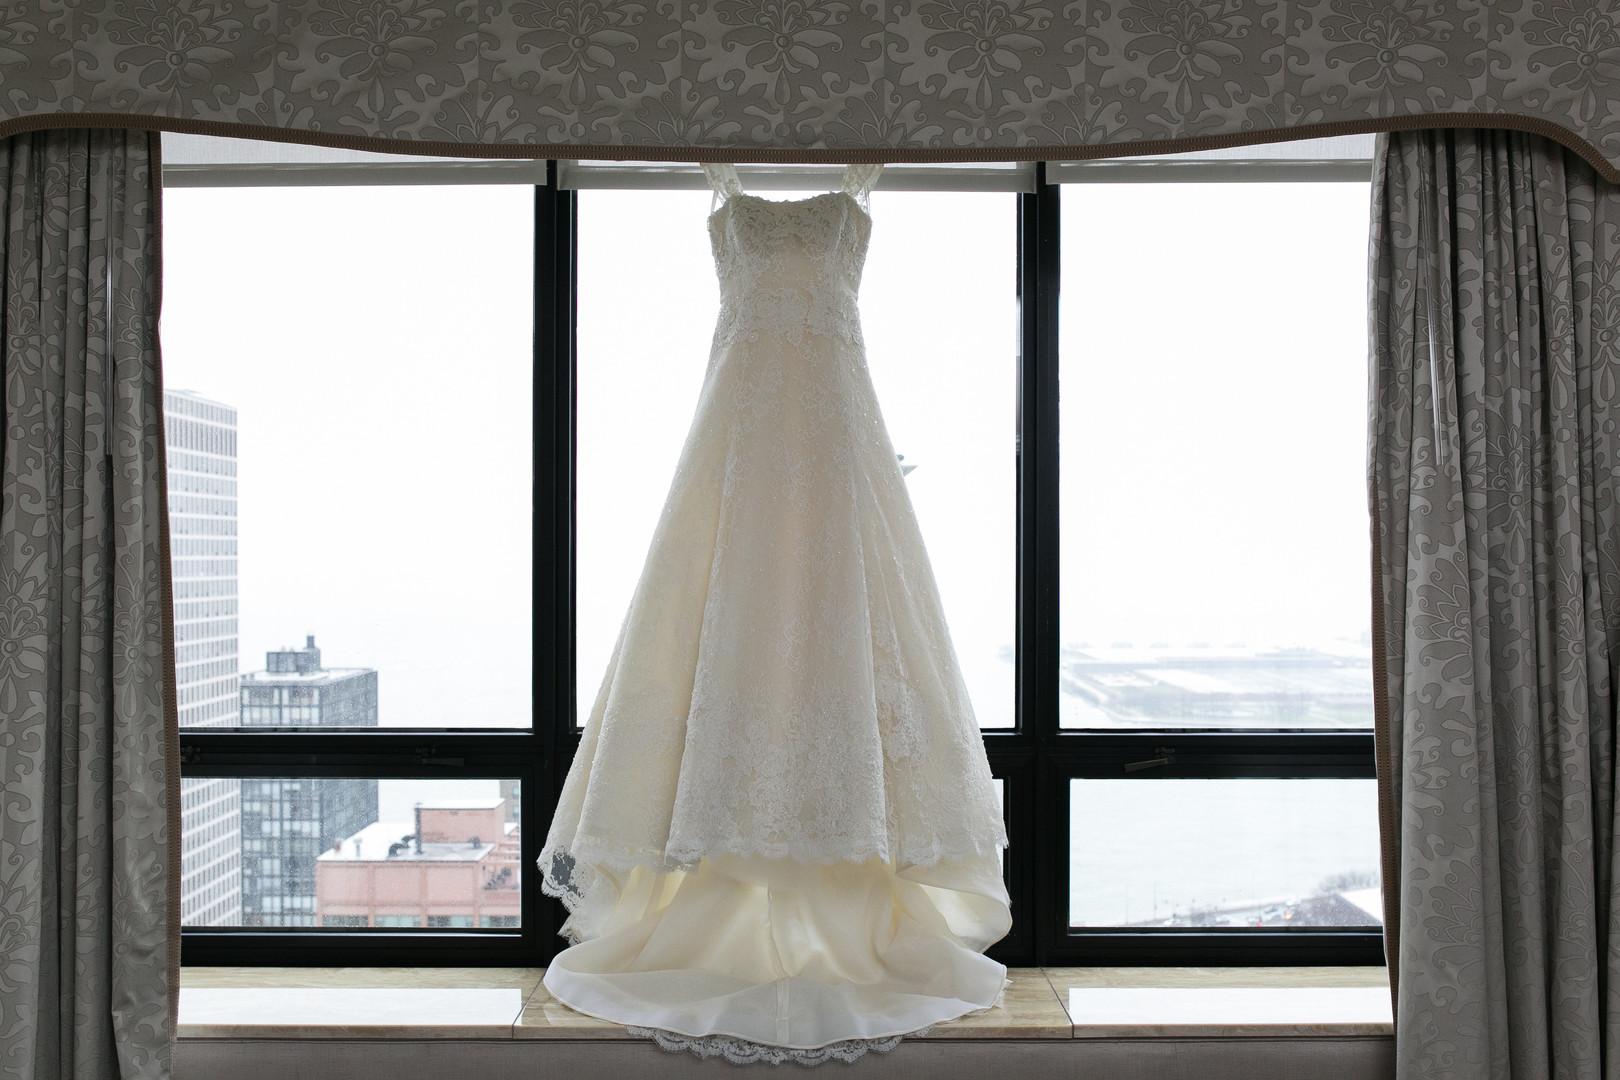 White A Line Romantic Wedding Dress Chicago Wedding Emilia Jane Photography